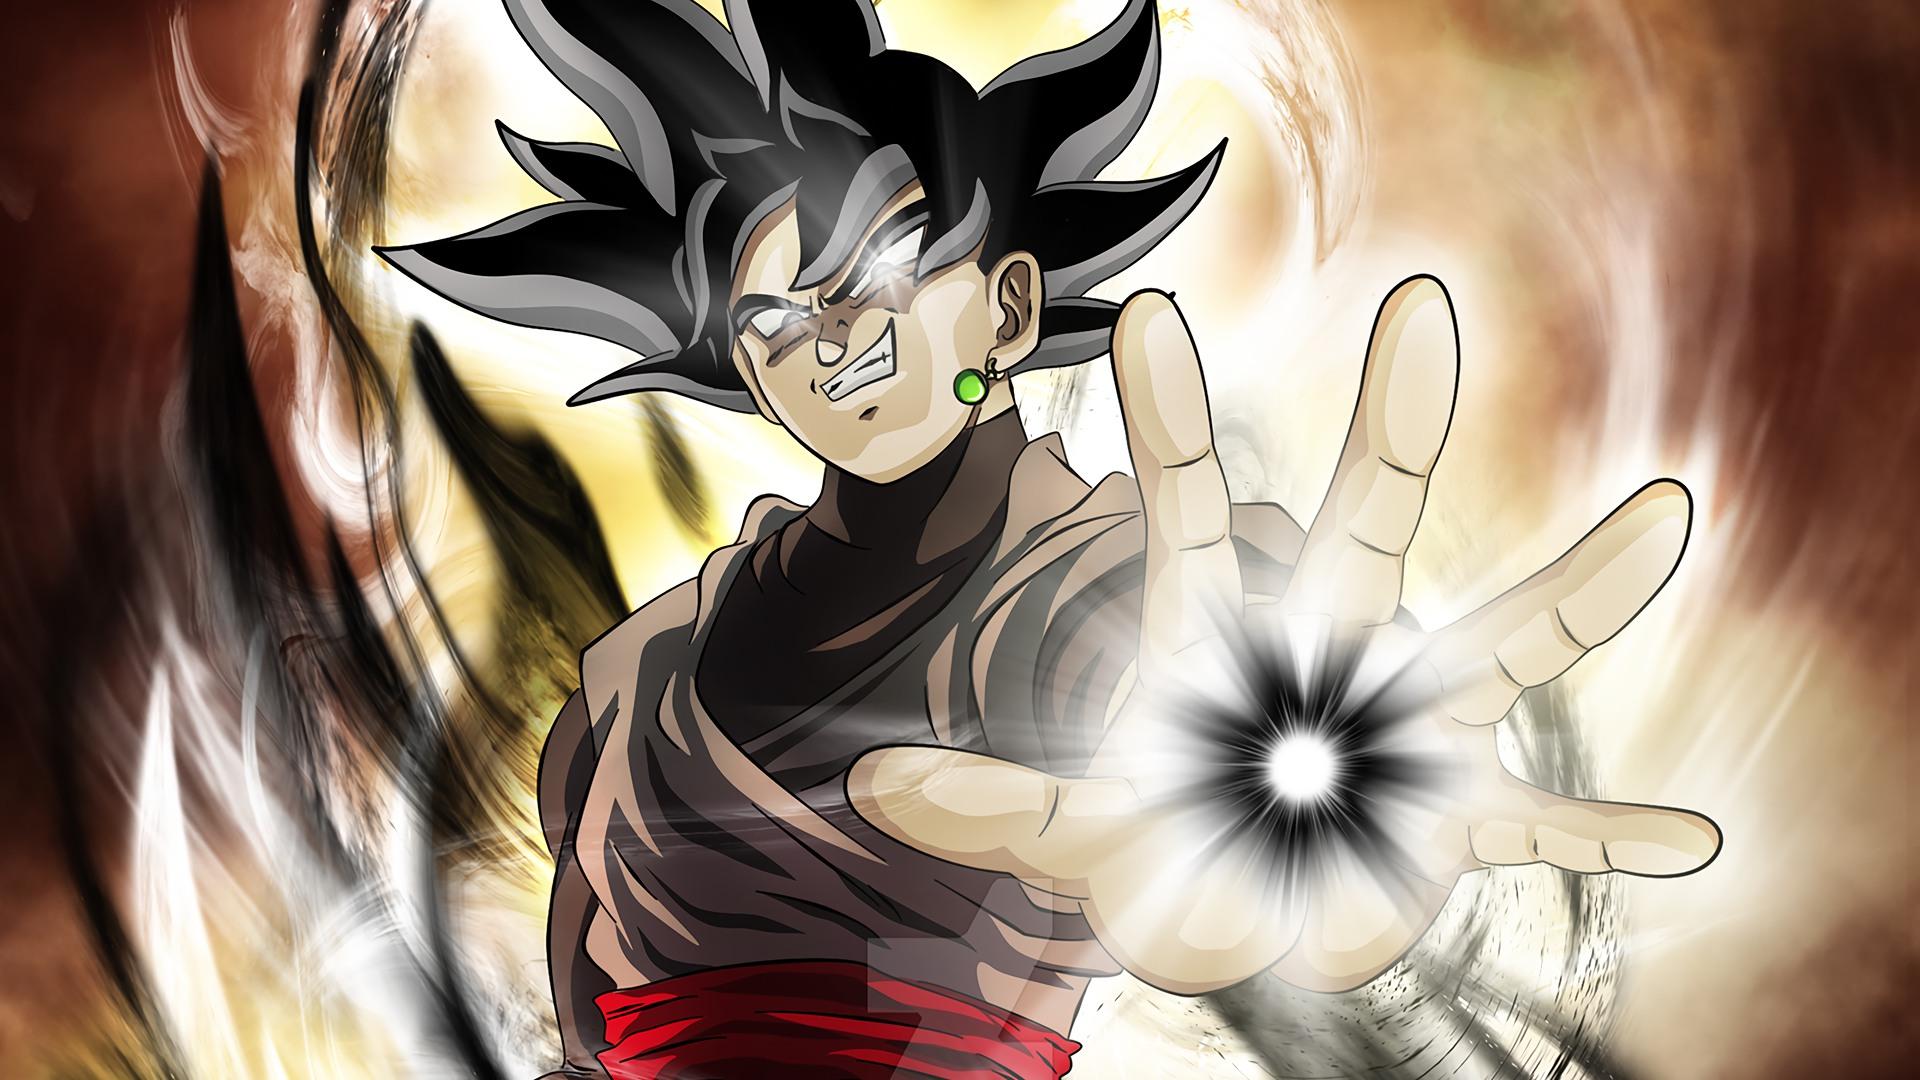 Dragon Ball Super Black Goku Hd Wallpaper Background Image